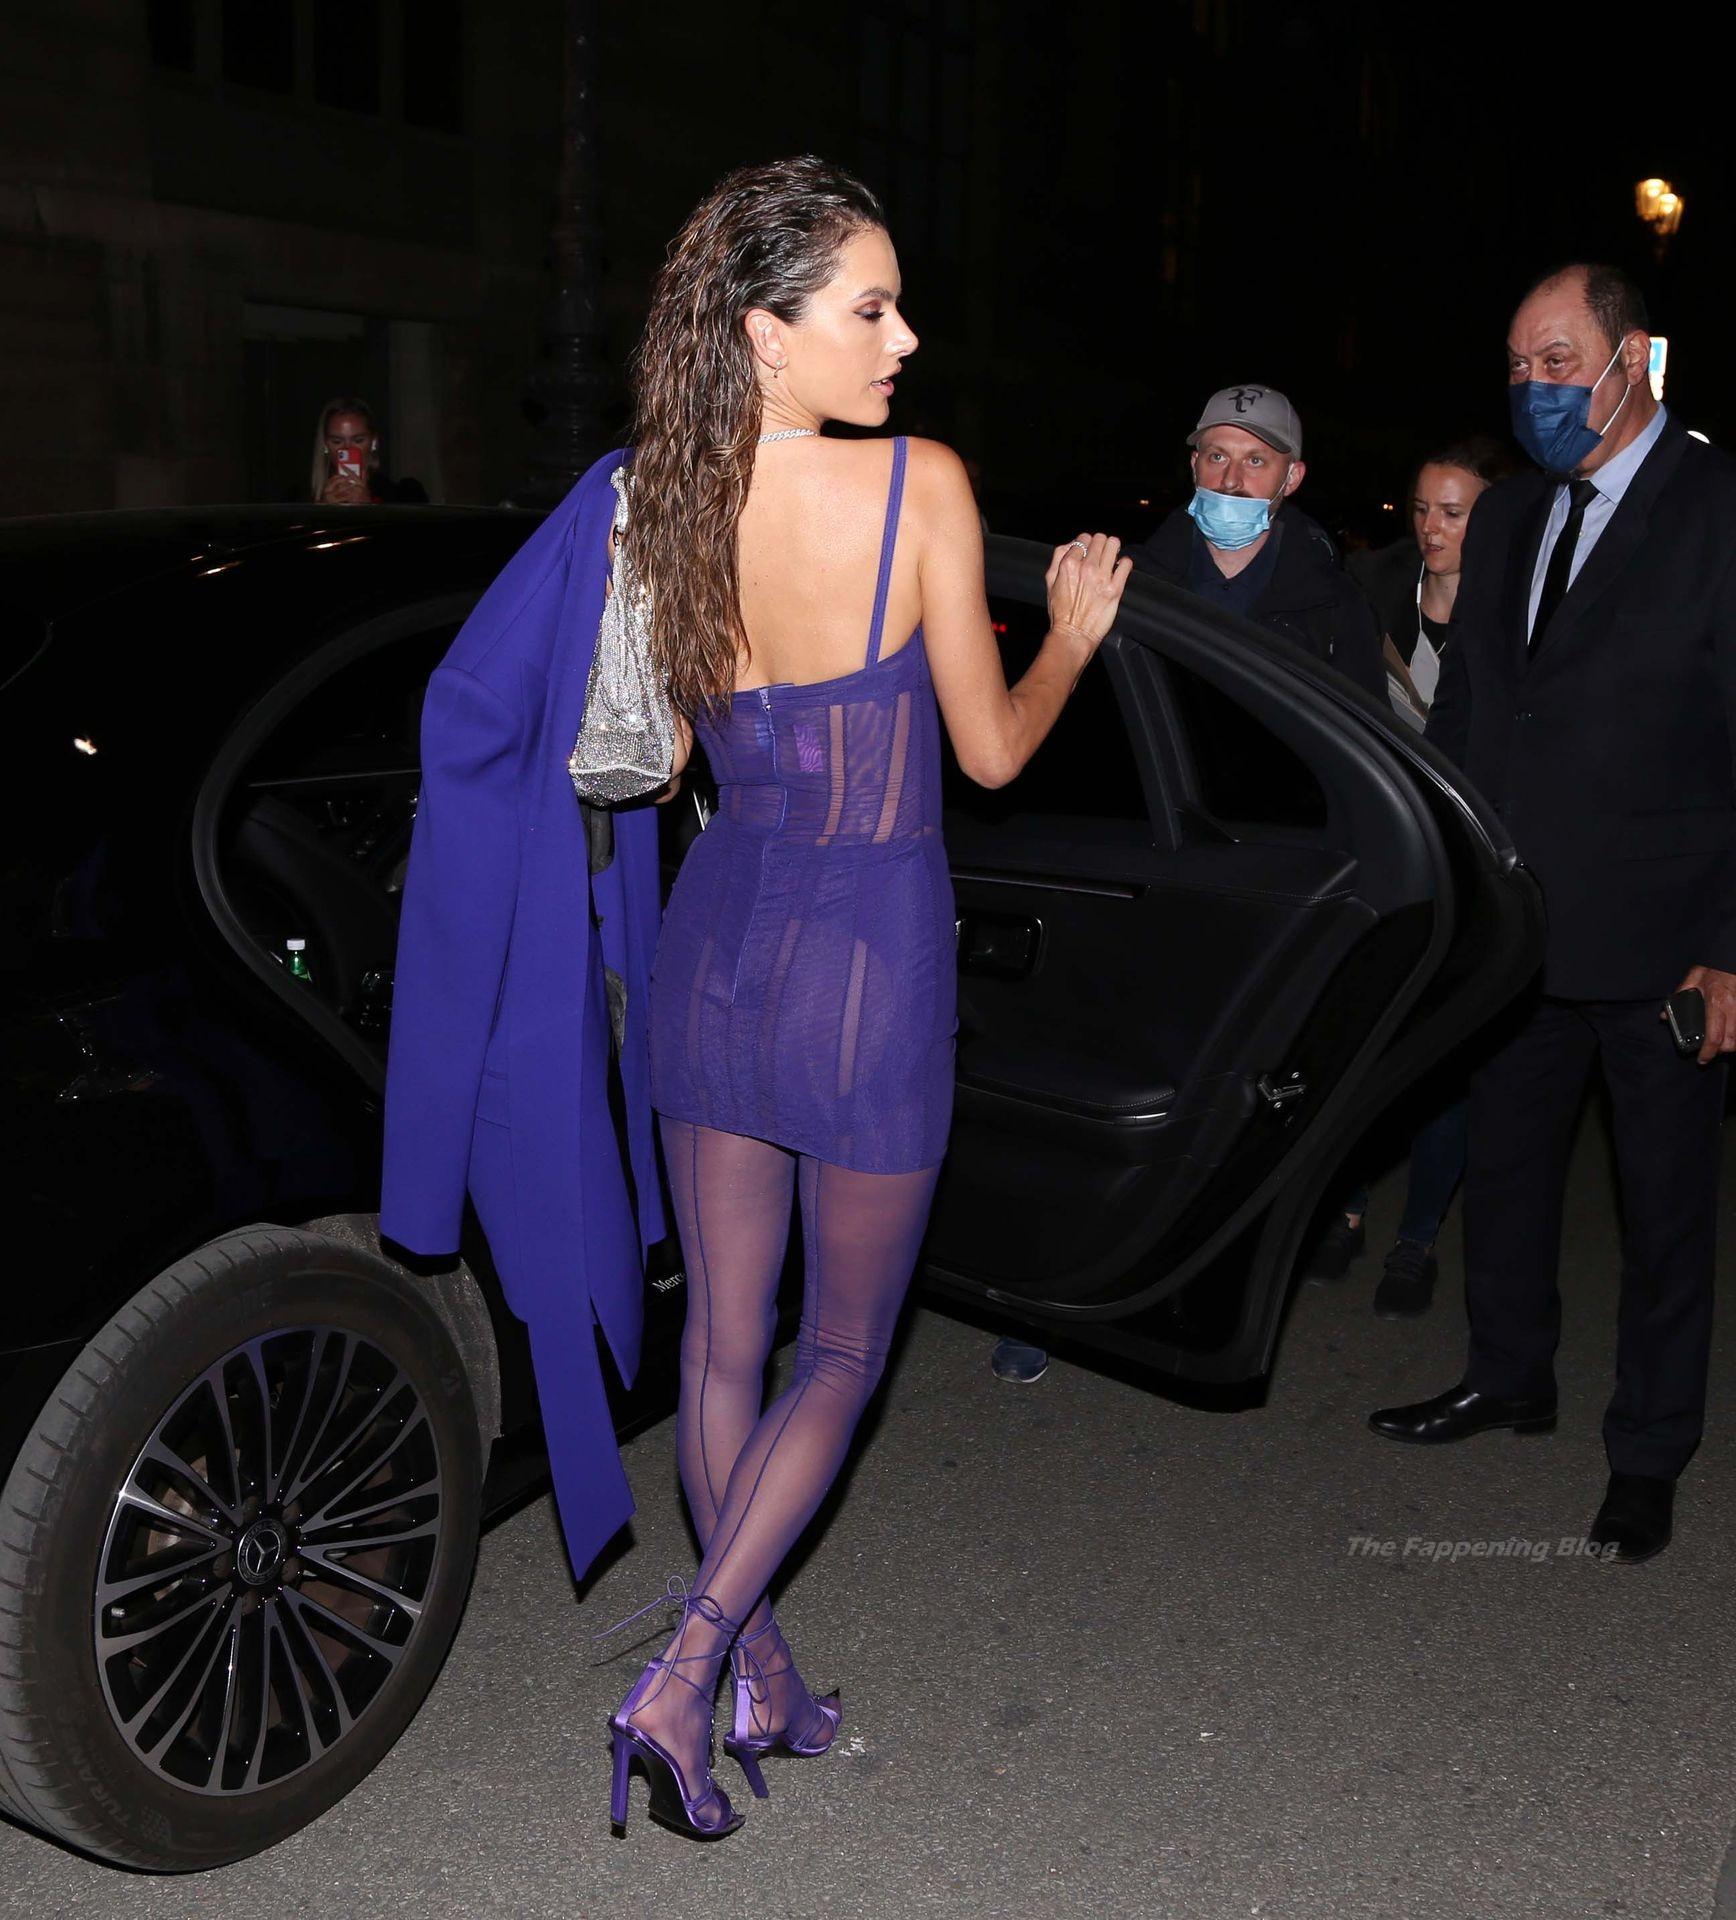 Alessandra-Ambrosio-Sexy-The-Fappening-Blog-61-1.jpg